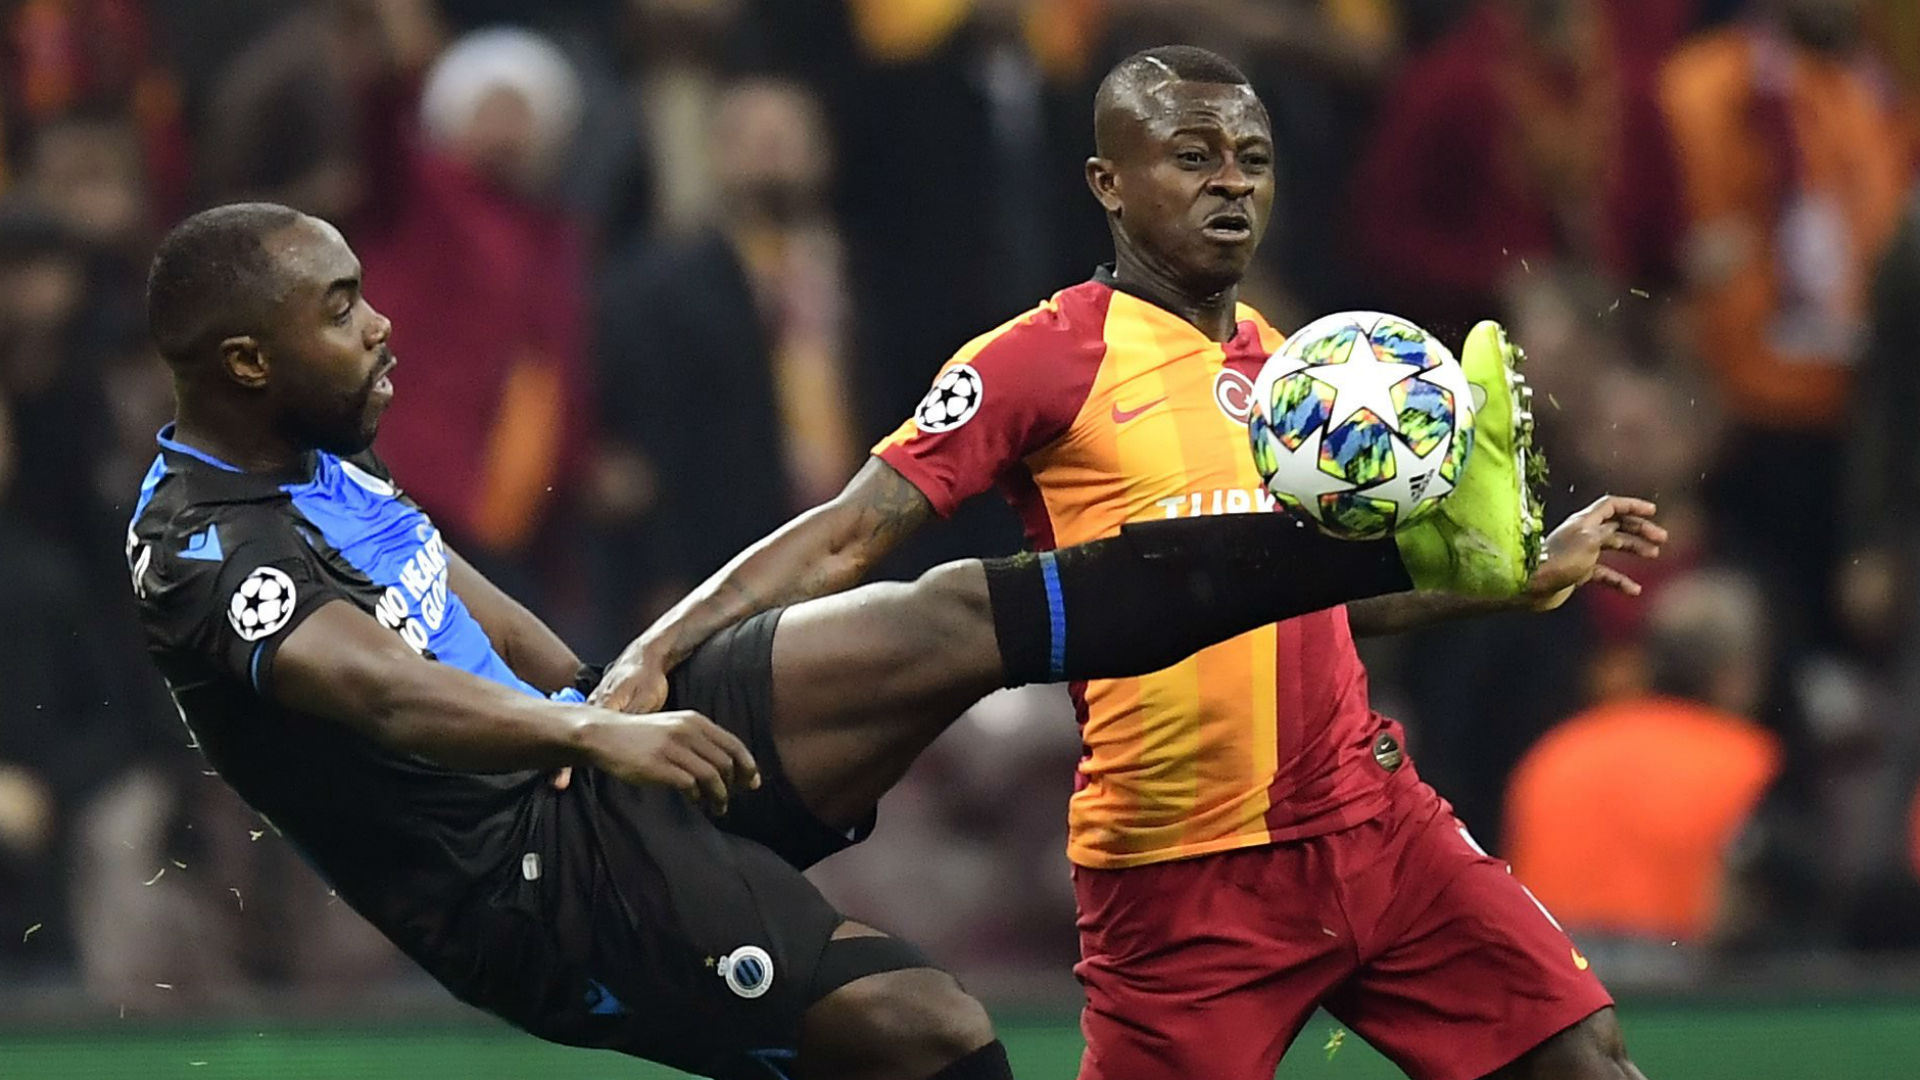 Galatasaray vs. Club Brugge - Football Match Report